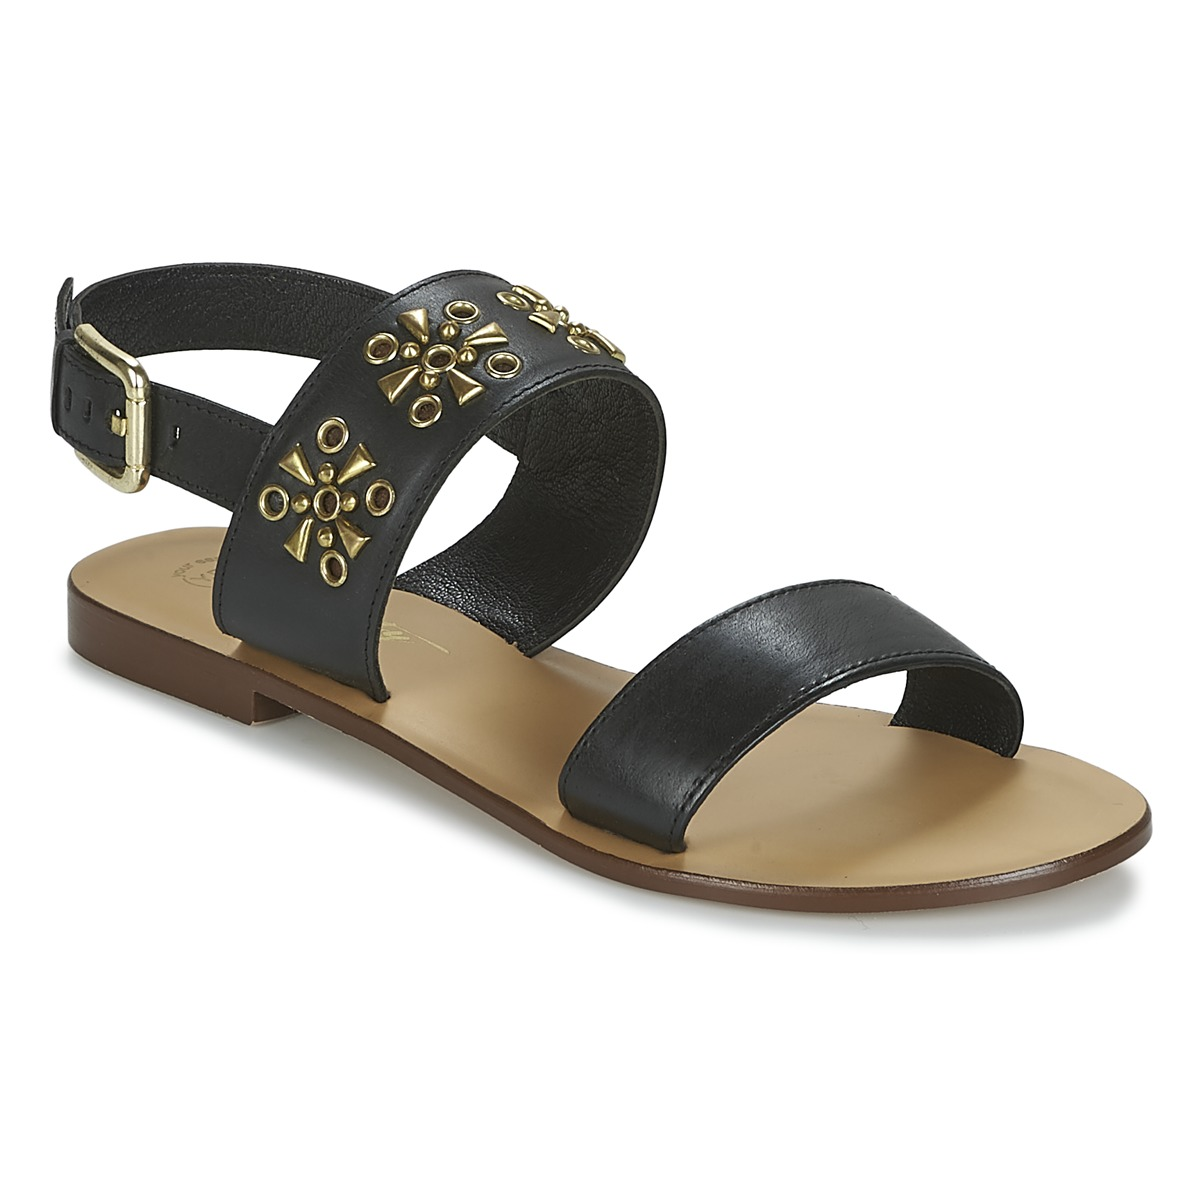 Betty London IKIMI Schwarz - Kostenloser Versand bei Spartoode ! - Schuhe Sandalen / Sandaletten Damen 28,79 €